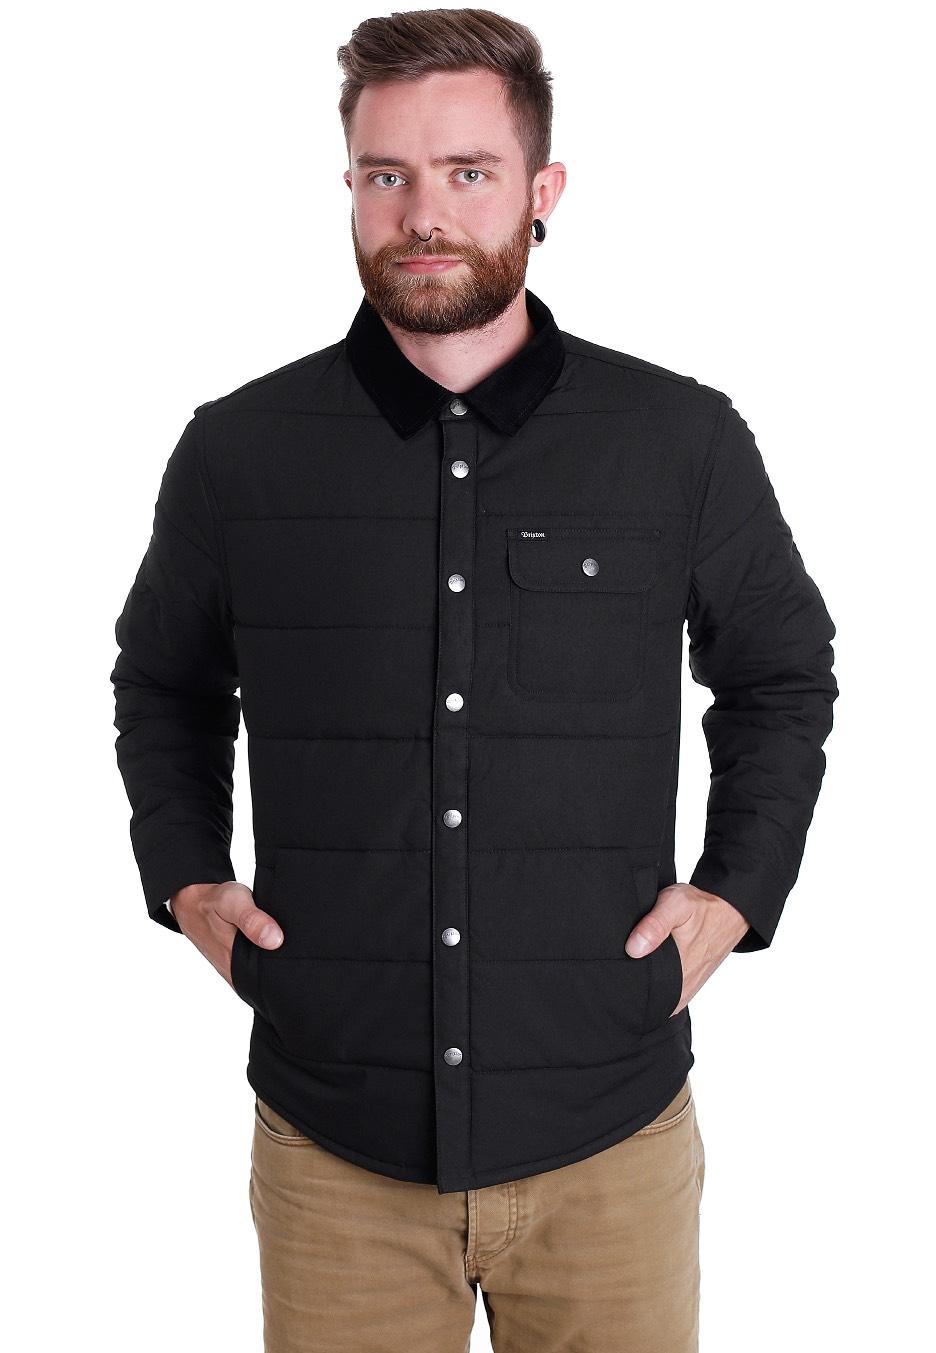 Brixton - Cass Black Black - Jacket - Streetwear Shop - Impericon.com UK 3457e0fa01d